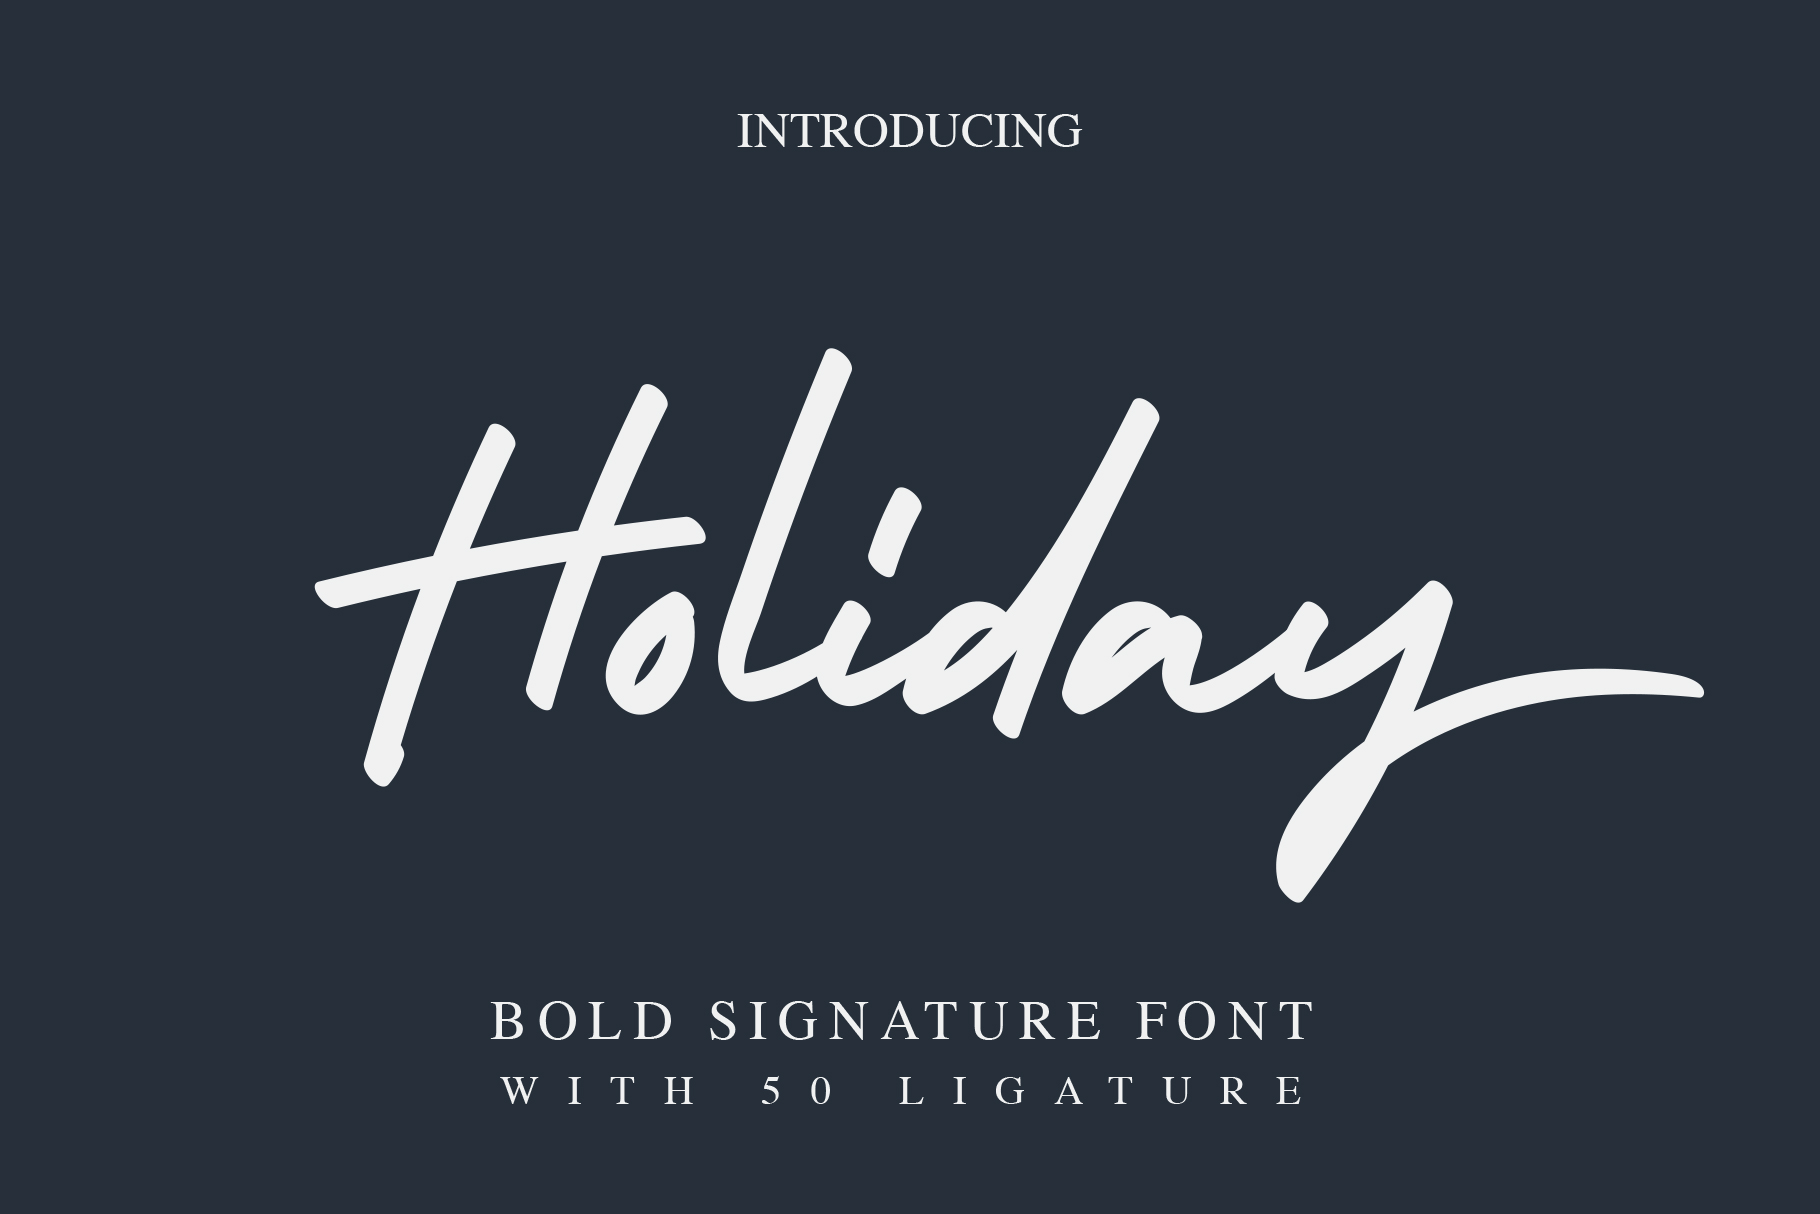 Holiday - Bold Signature Font example image 1